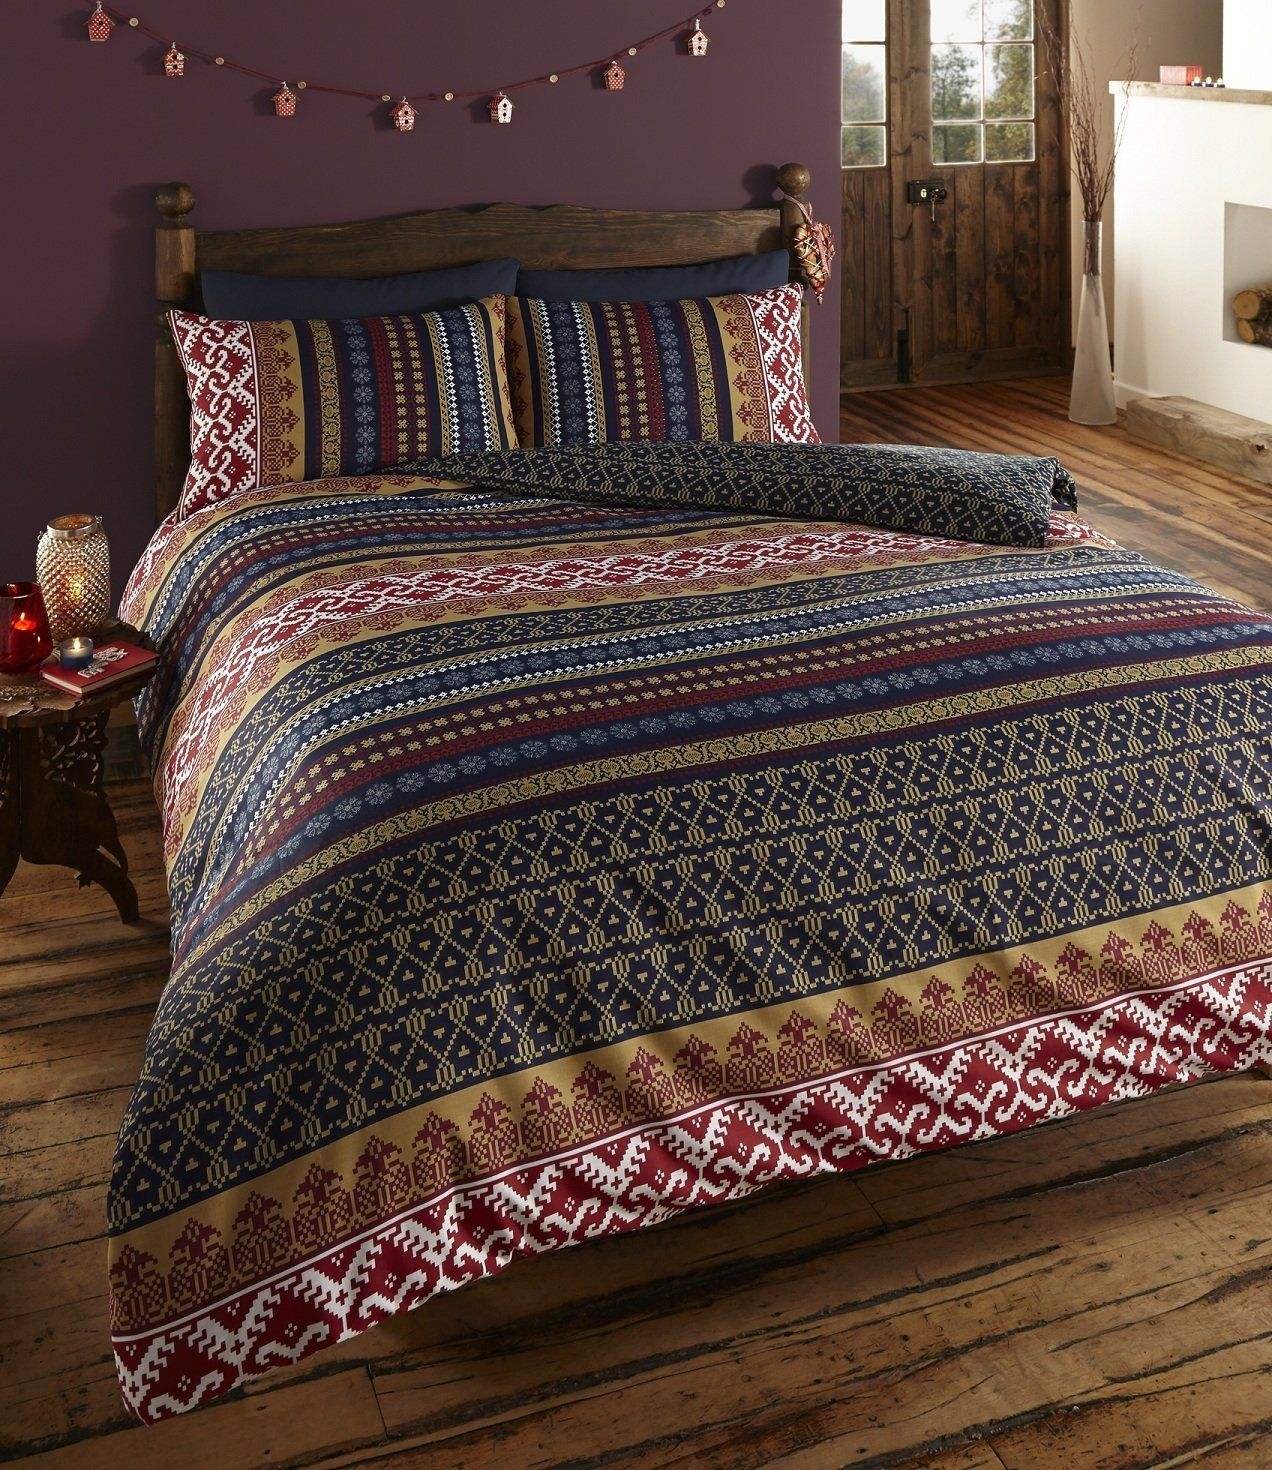 Pin on Bed Set Etnic